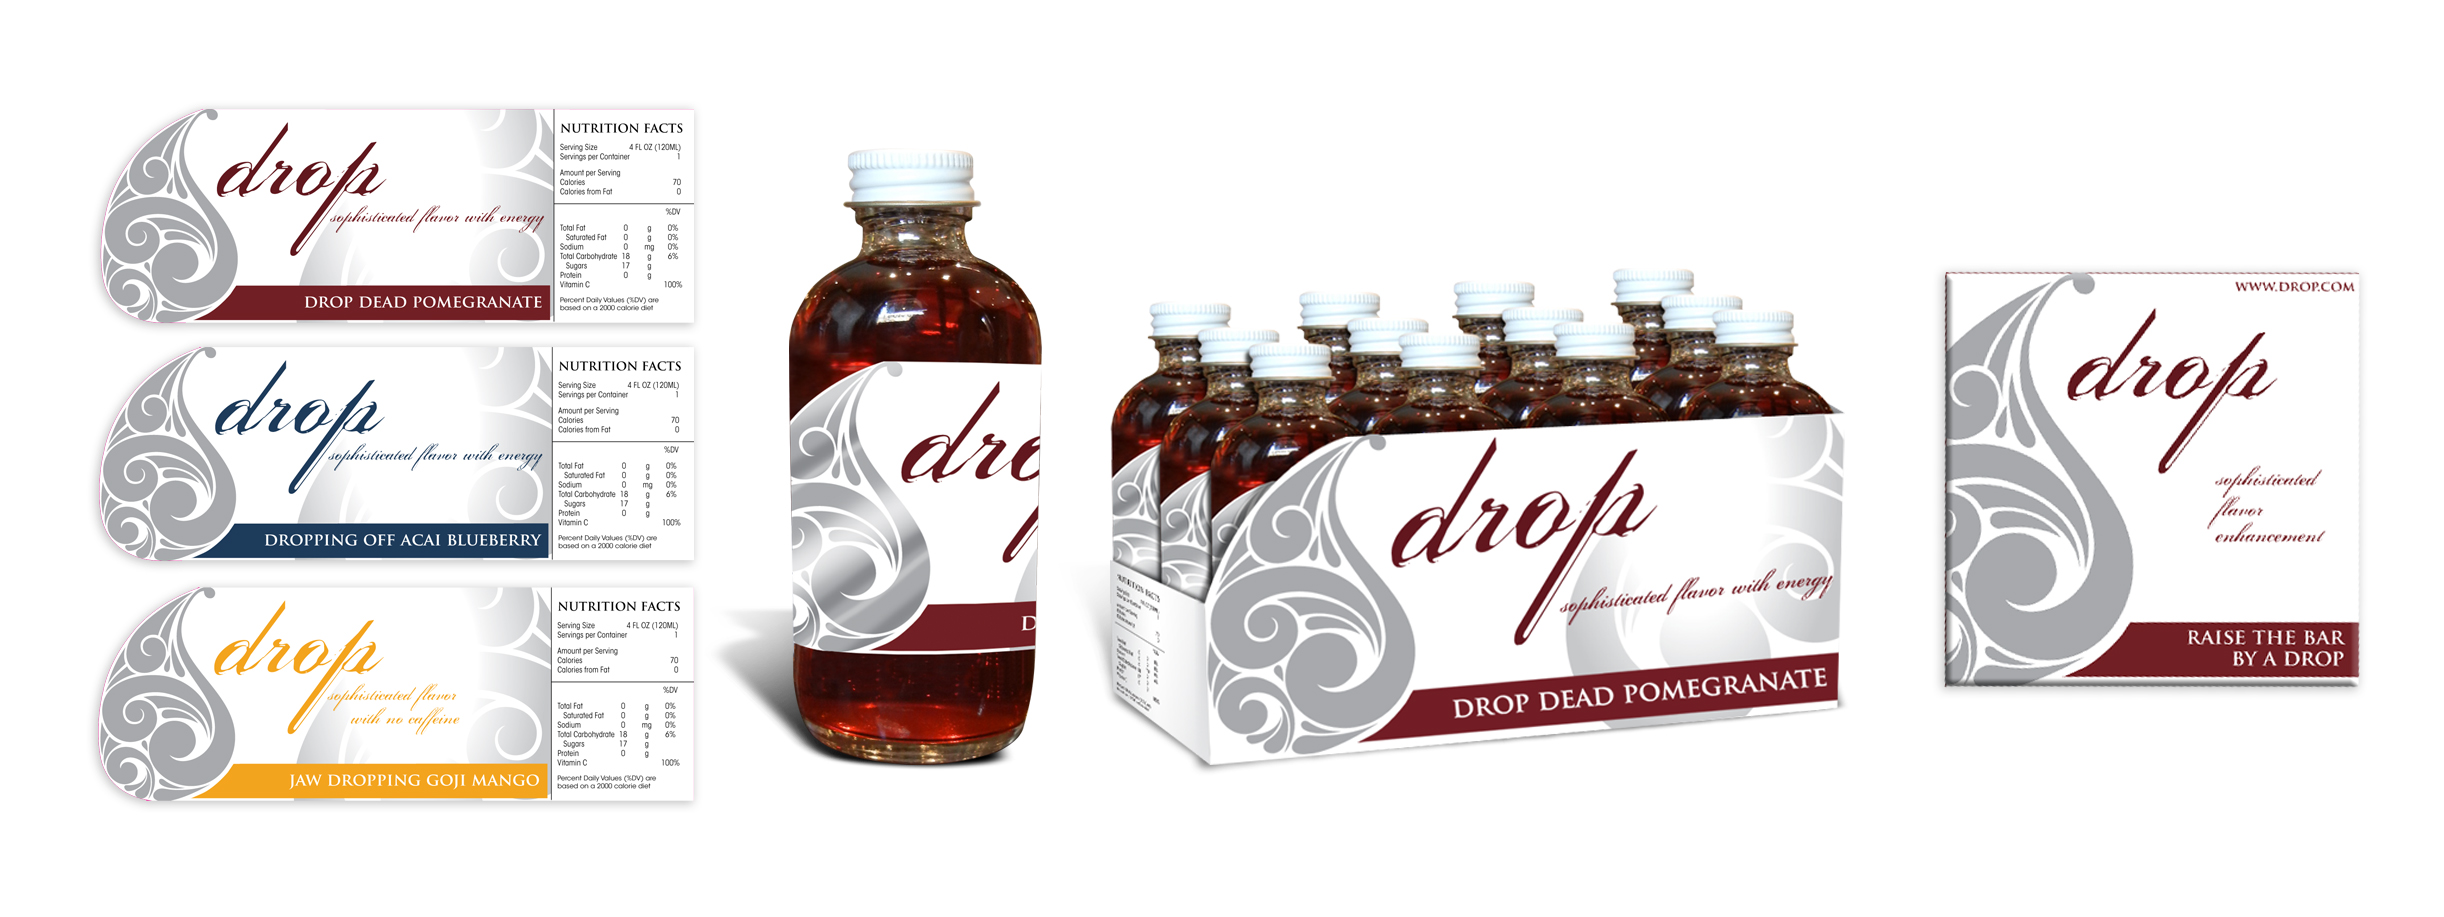 Beverage Company  /  Drop   /   Alternative Packaging Design Bottle labels, bottle and table top packaging, Bar Napkin